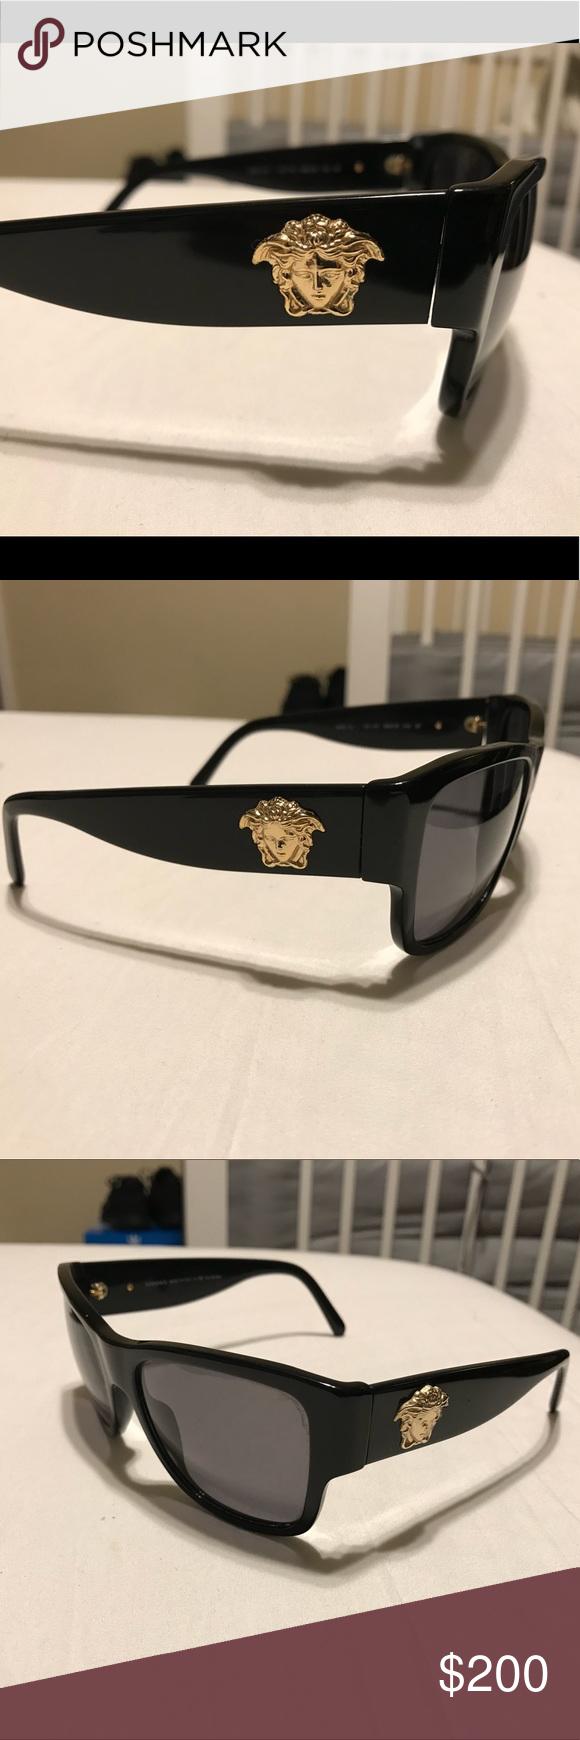 4ce8a99d88d Versace Men Sunglasses with GOLD MEDUSA Vet good condition. Original men  Versace sunglasses with gold Medusa Versace Accessories Sunglasses